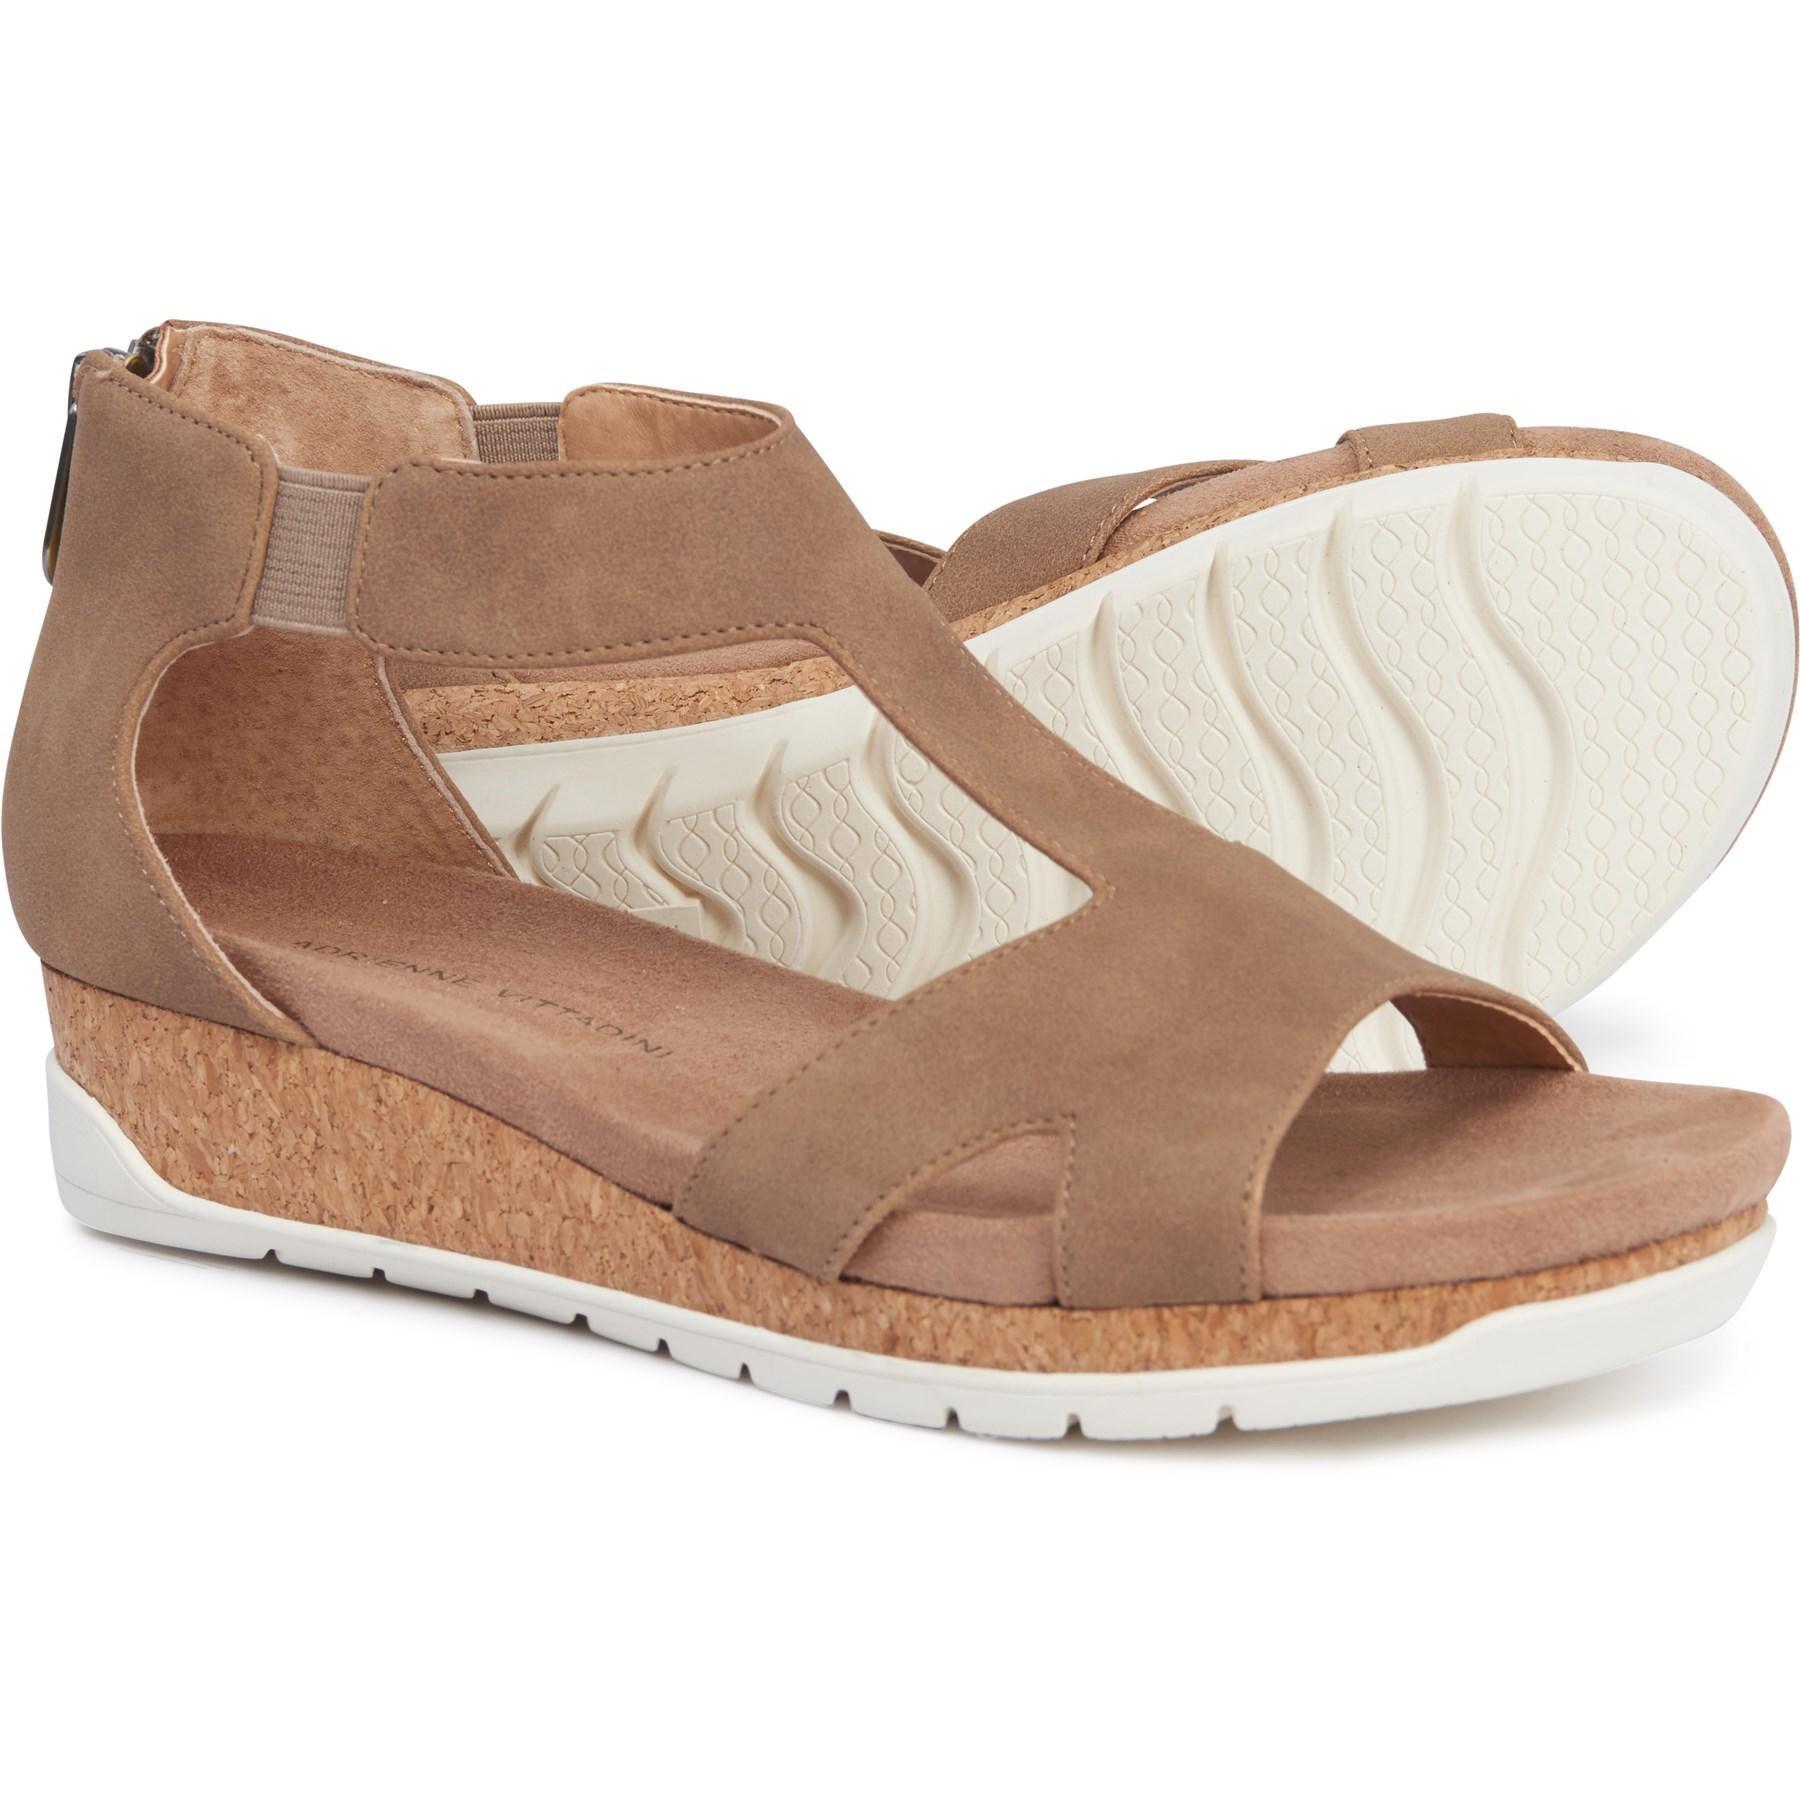 62e58b3531 Adrienne Vittadini Tullio Wedge Sandals (for Women) - Lyst